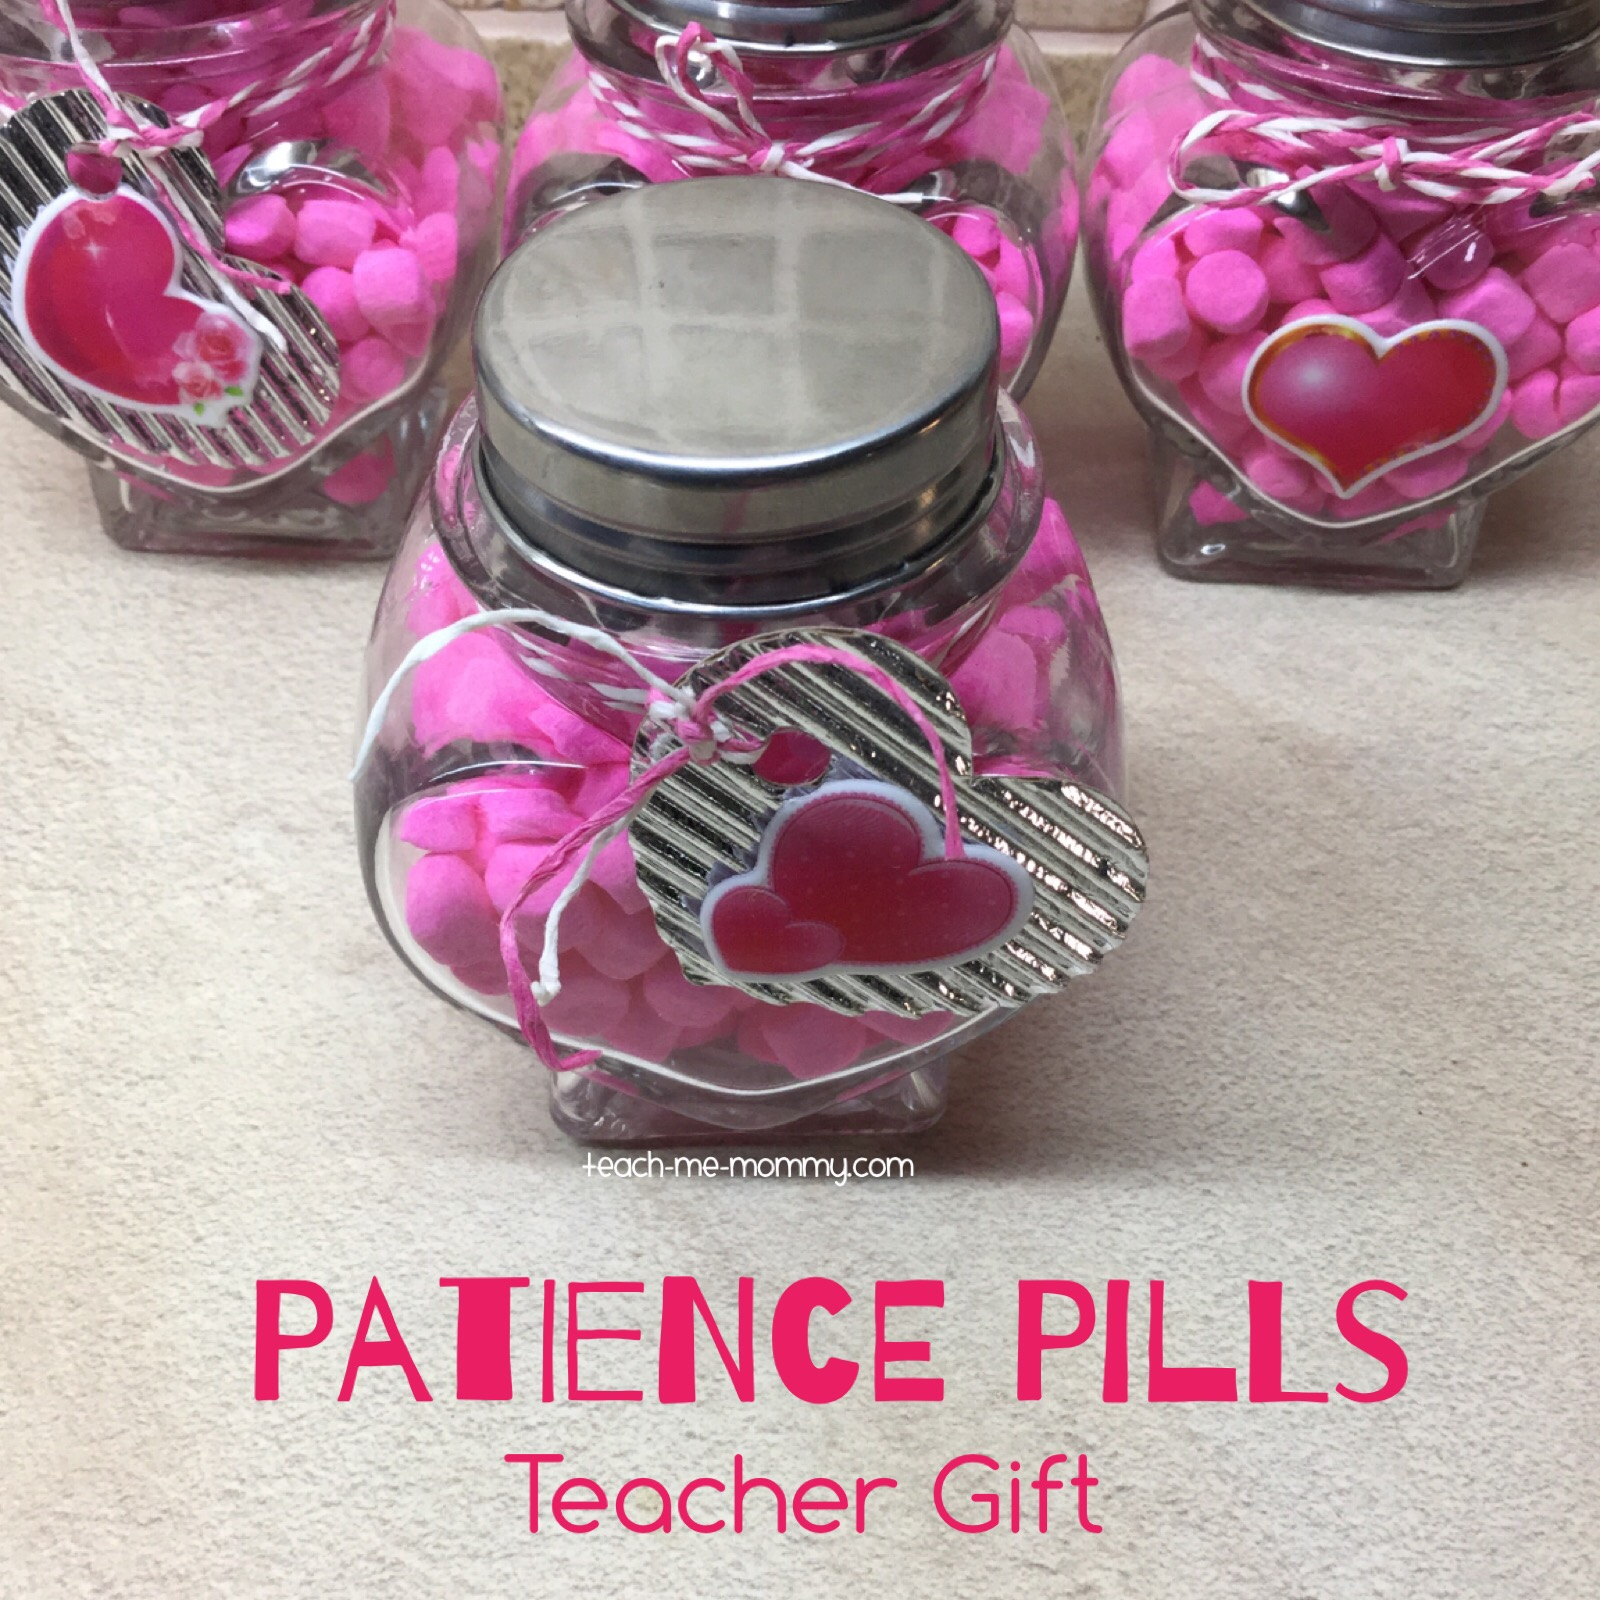 patience pills